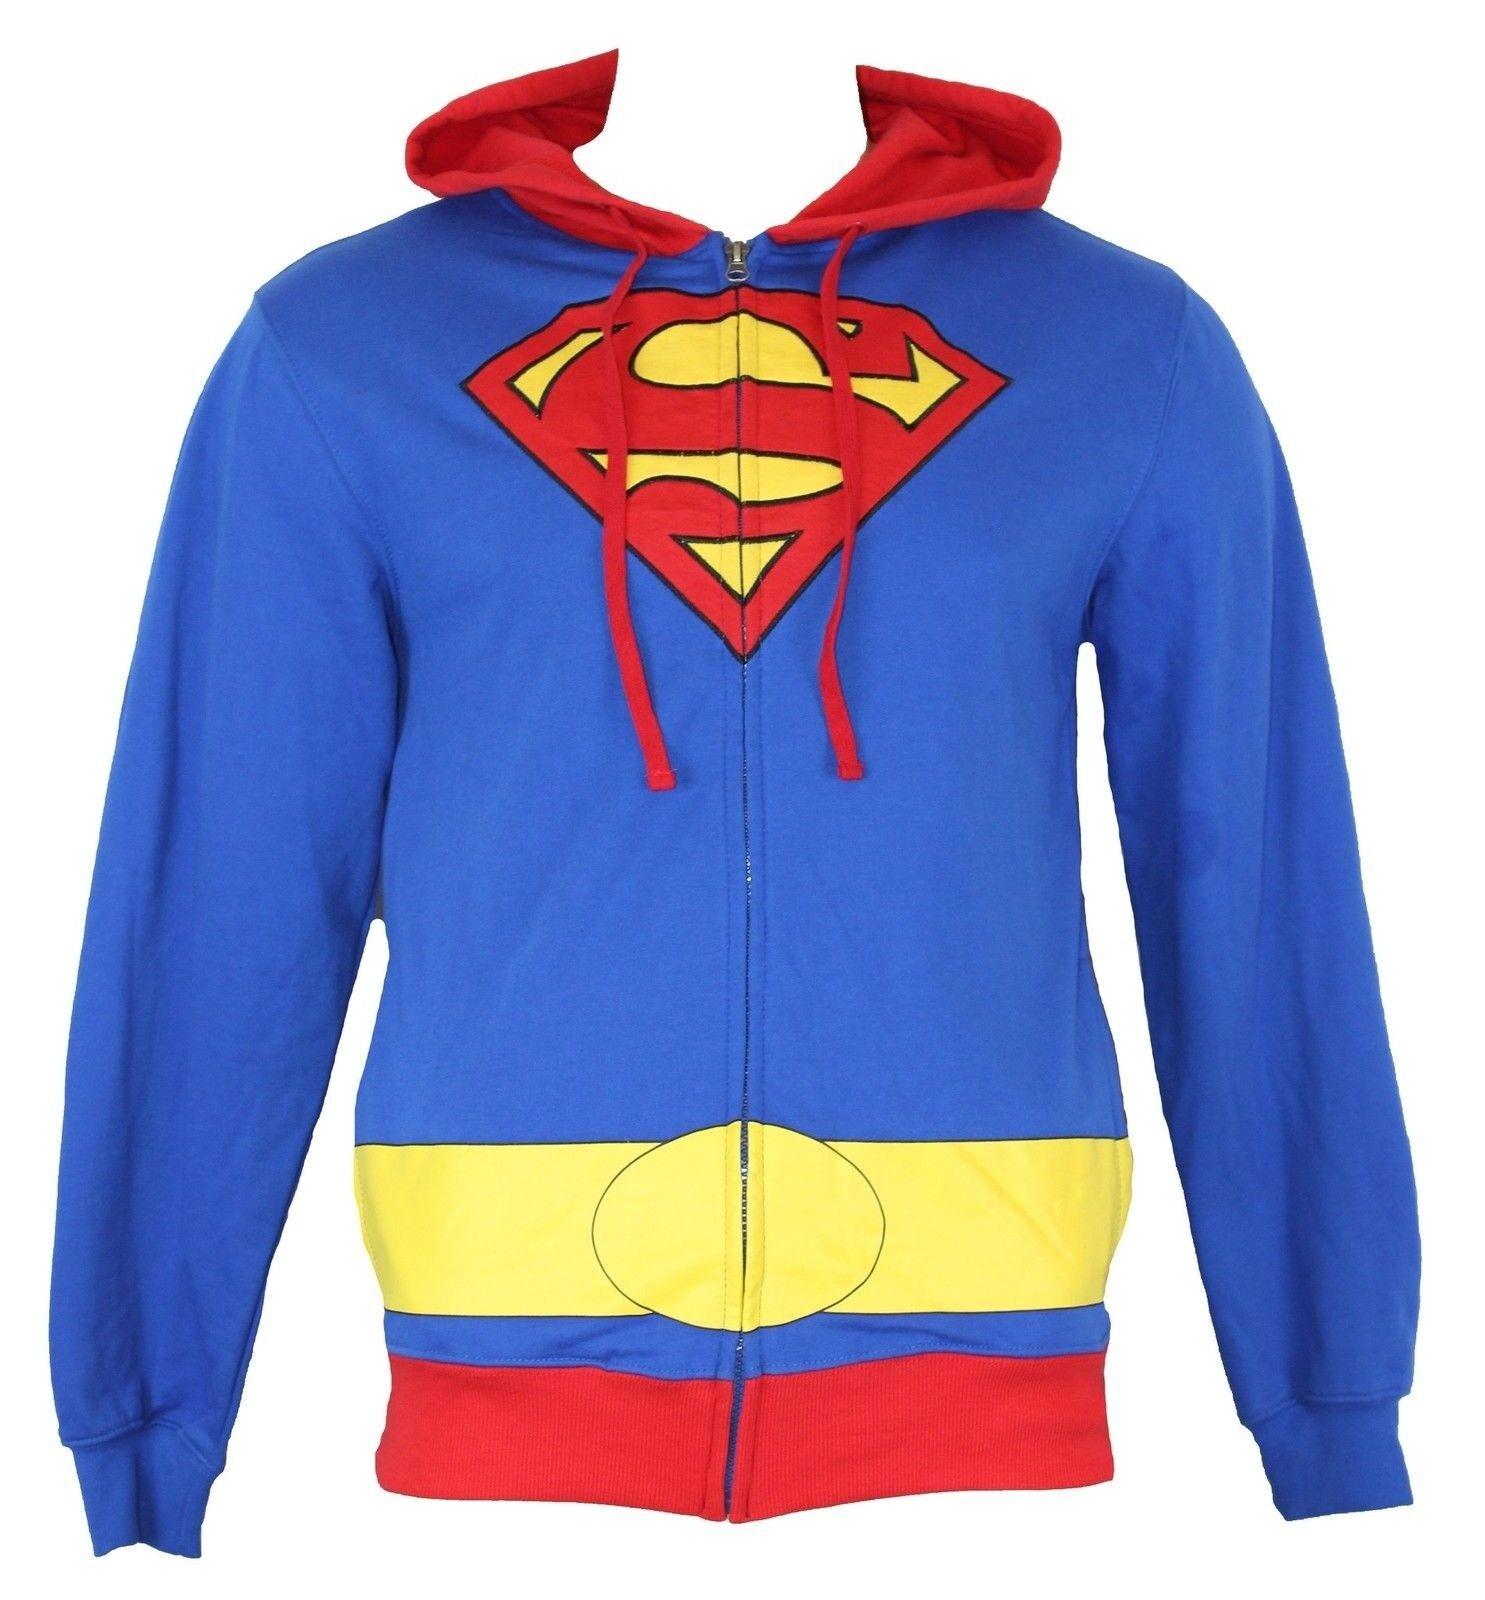 Superman Uomo Hoodie & Sweatshirt - Classic rosso blu & Hoodie giallo Costume Front Image ca4996